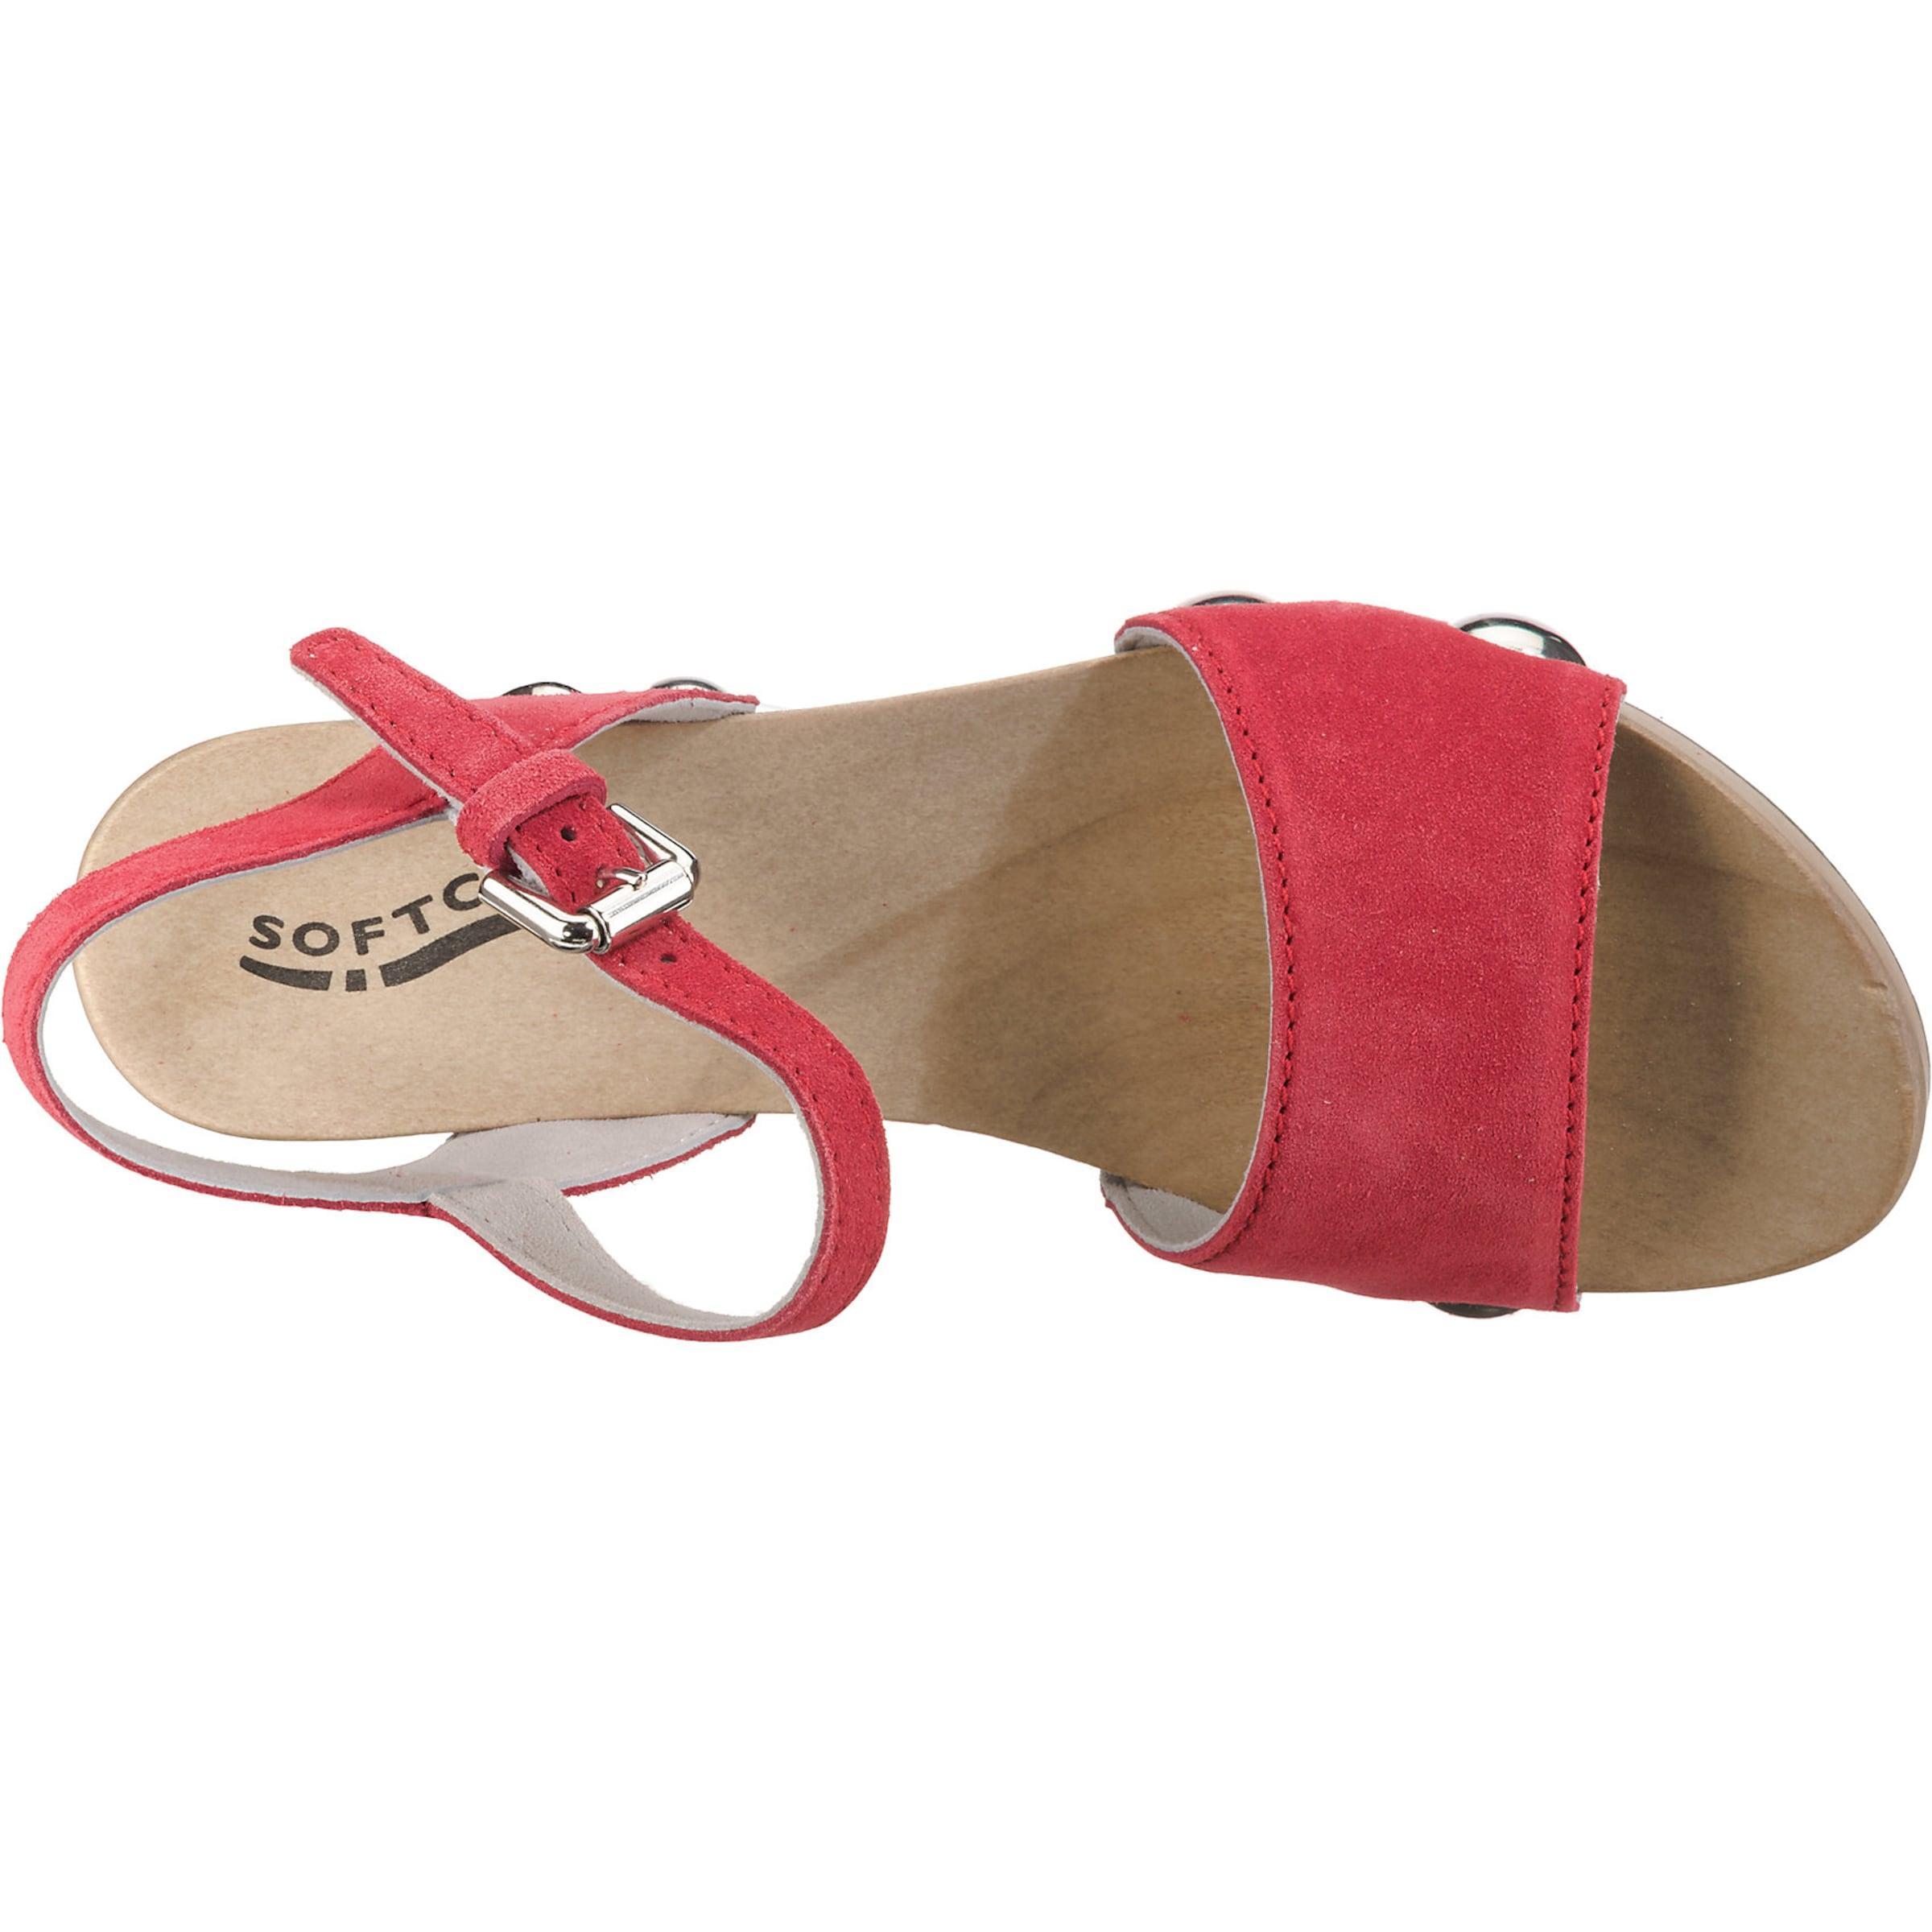 'eilyn' Rot 'eilyn' Sandalette Softclox In Rot Softclox In Softclox Sandalette RjqA5Sc34L